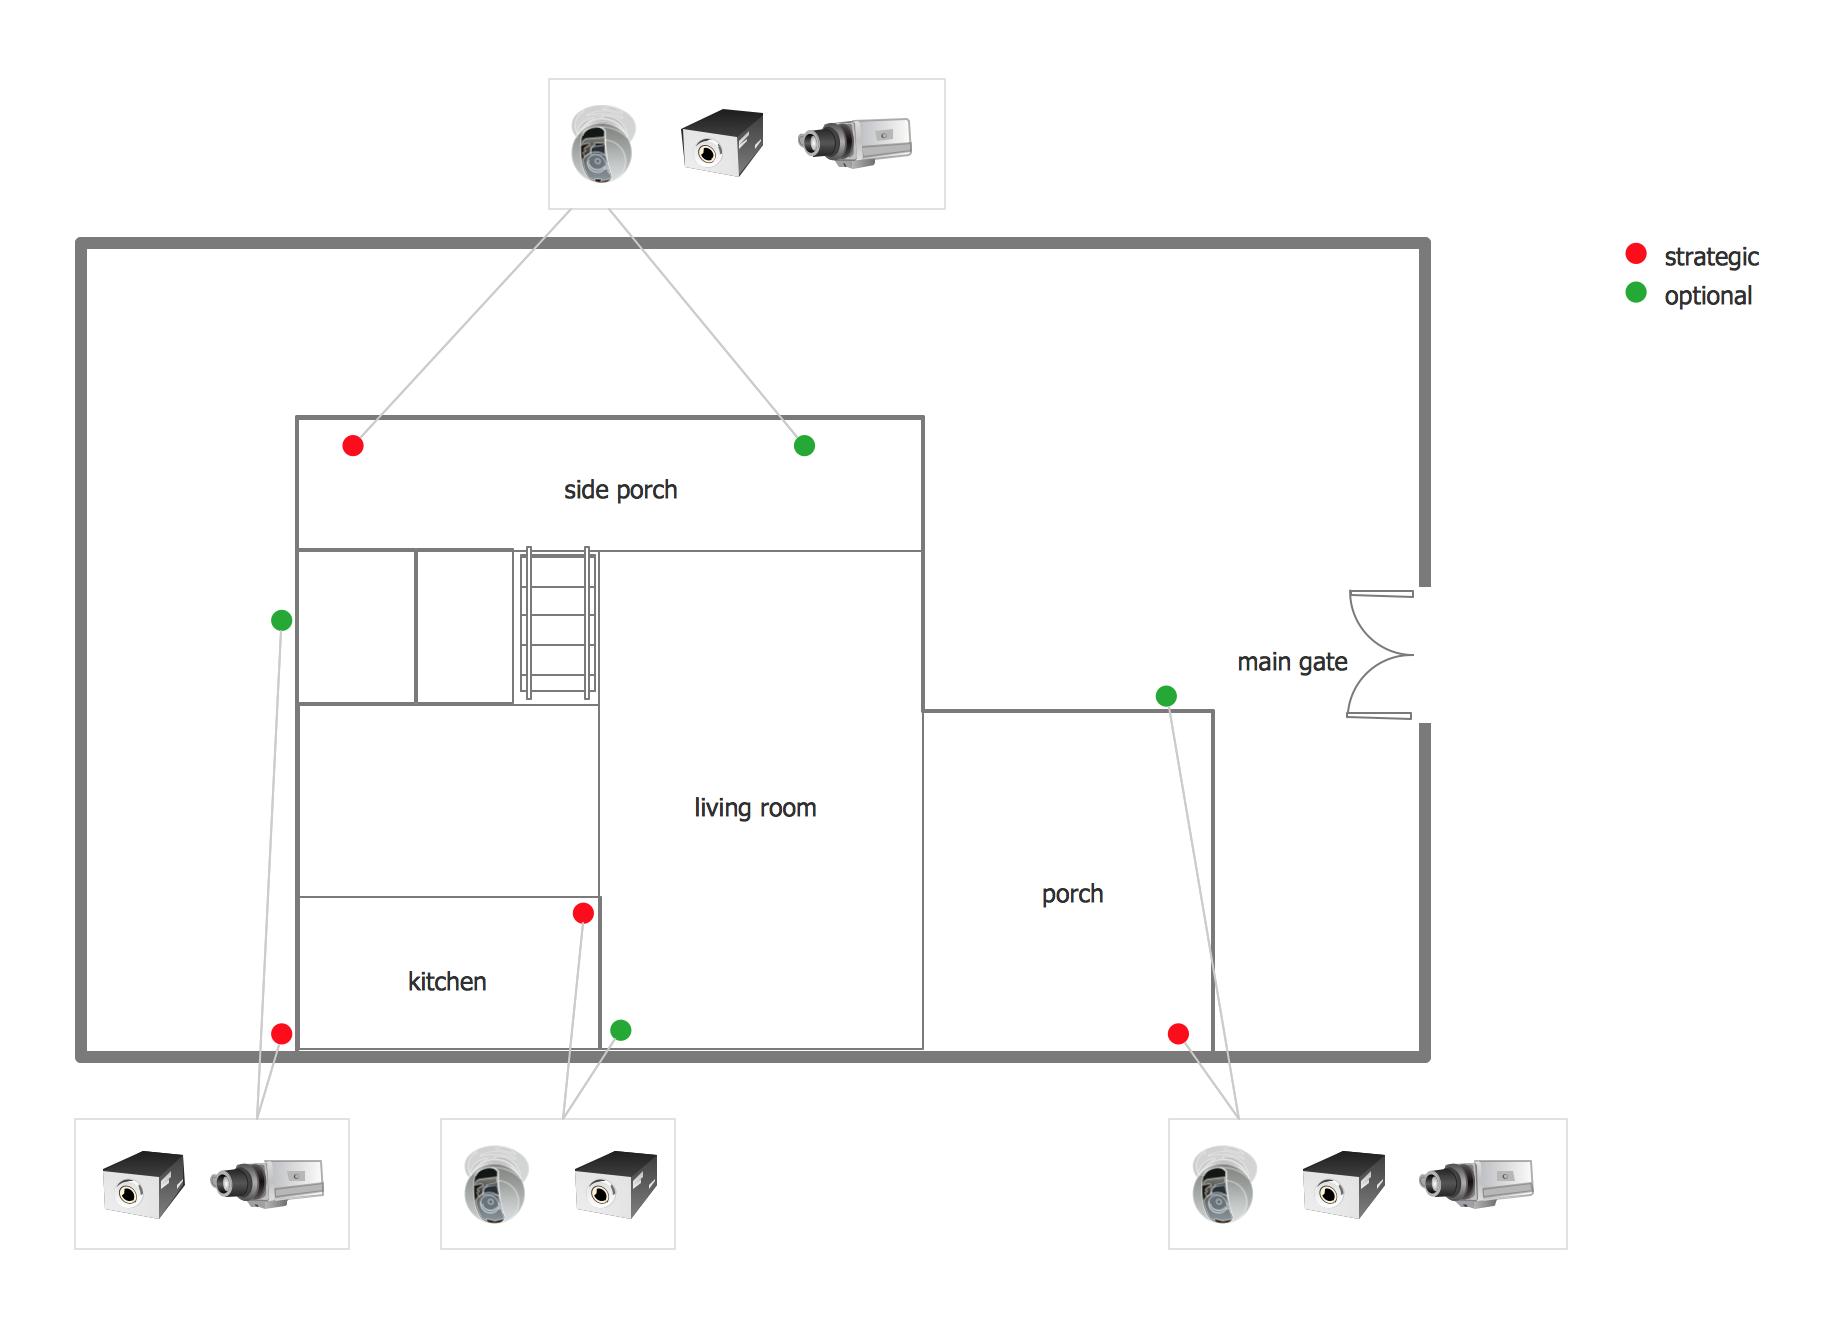 نقشه-سیم-کشی-دوربین-مداربسته-خانه,نقشه دوربین مداربسته,نقشه سیم کشی دوربین مداربسته,نرم افزار نقشه کشی دوربین مداربسته,نقشه سیم کشی دوربین مداربسته برای یک خانه